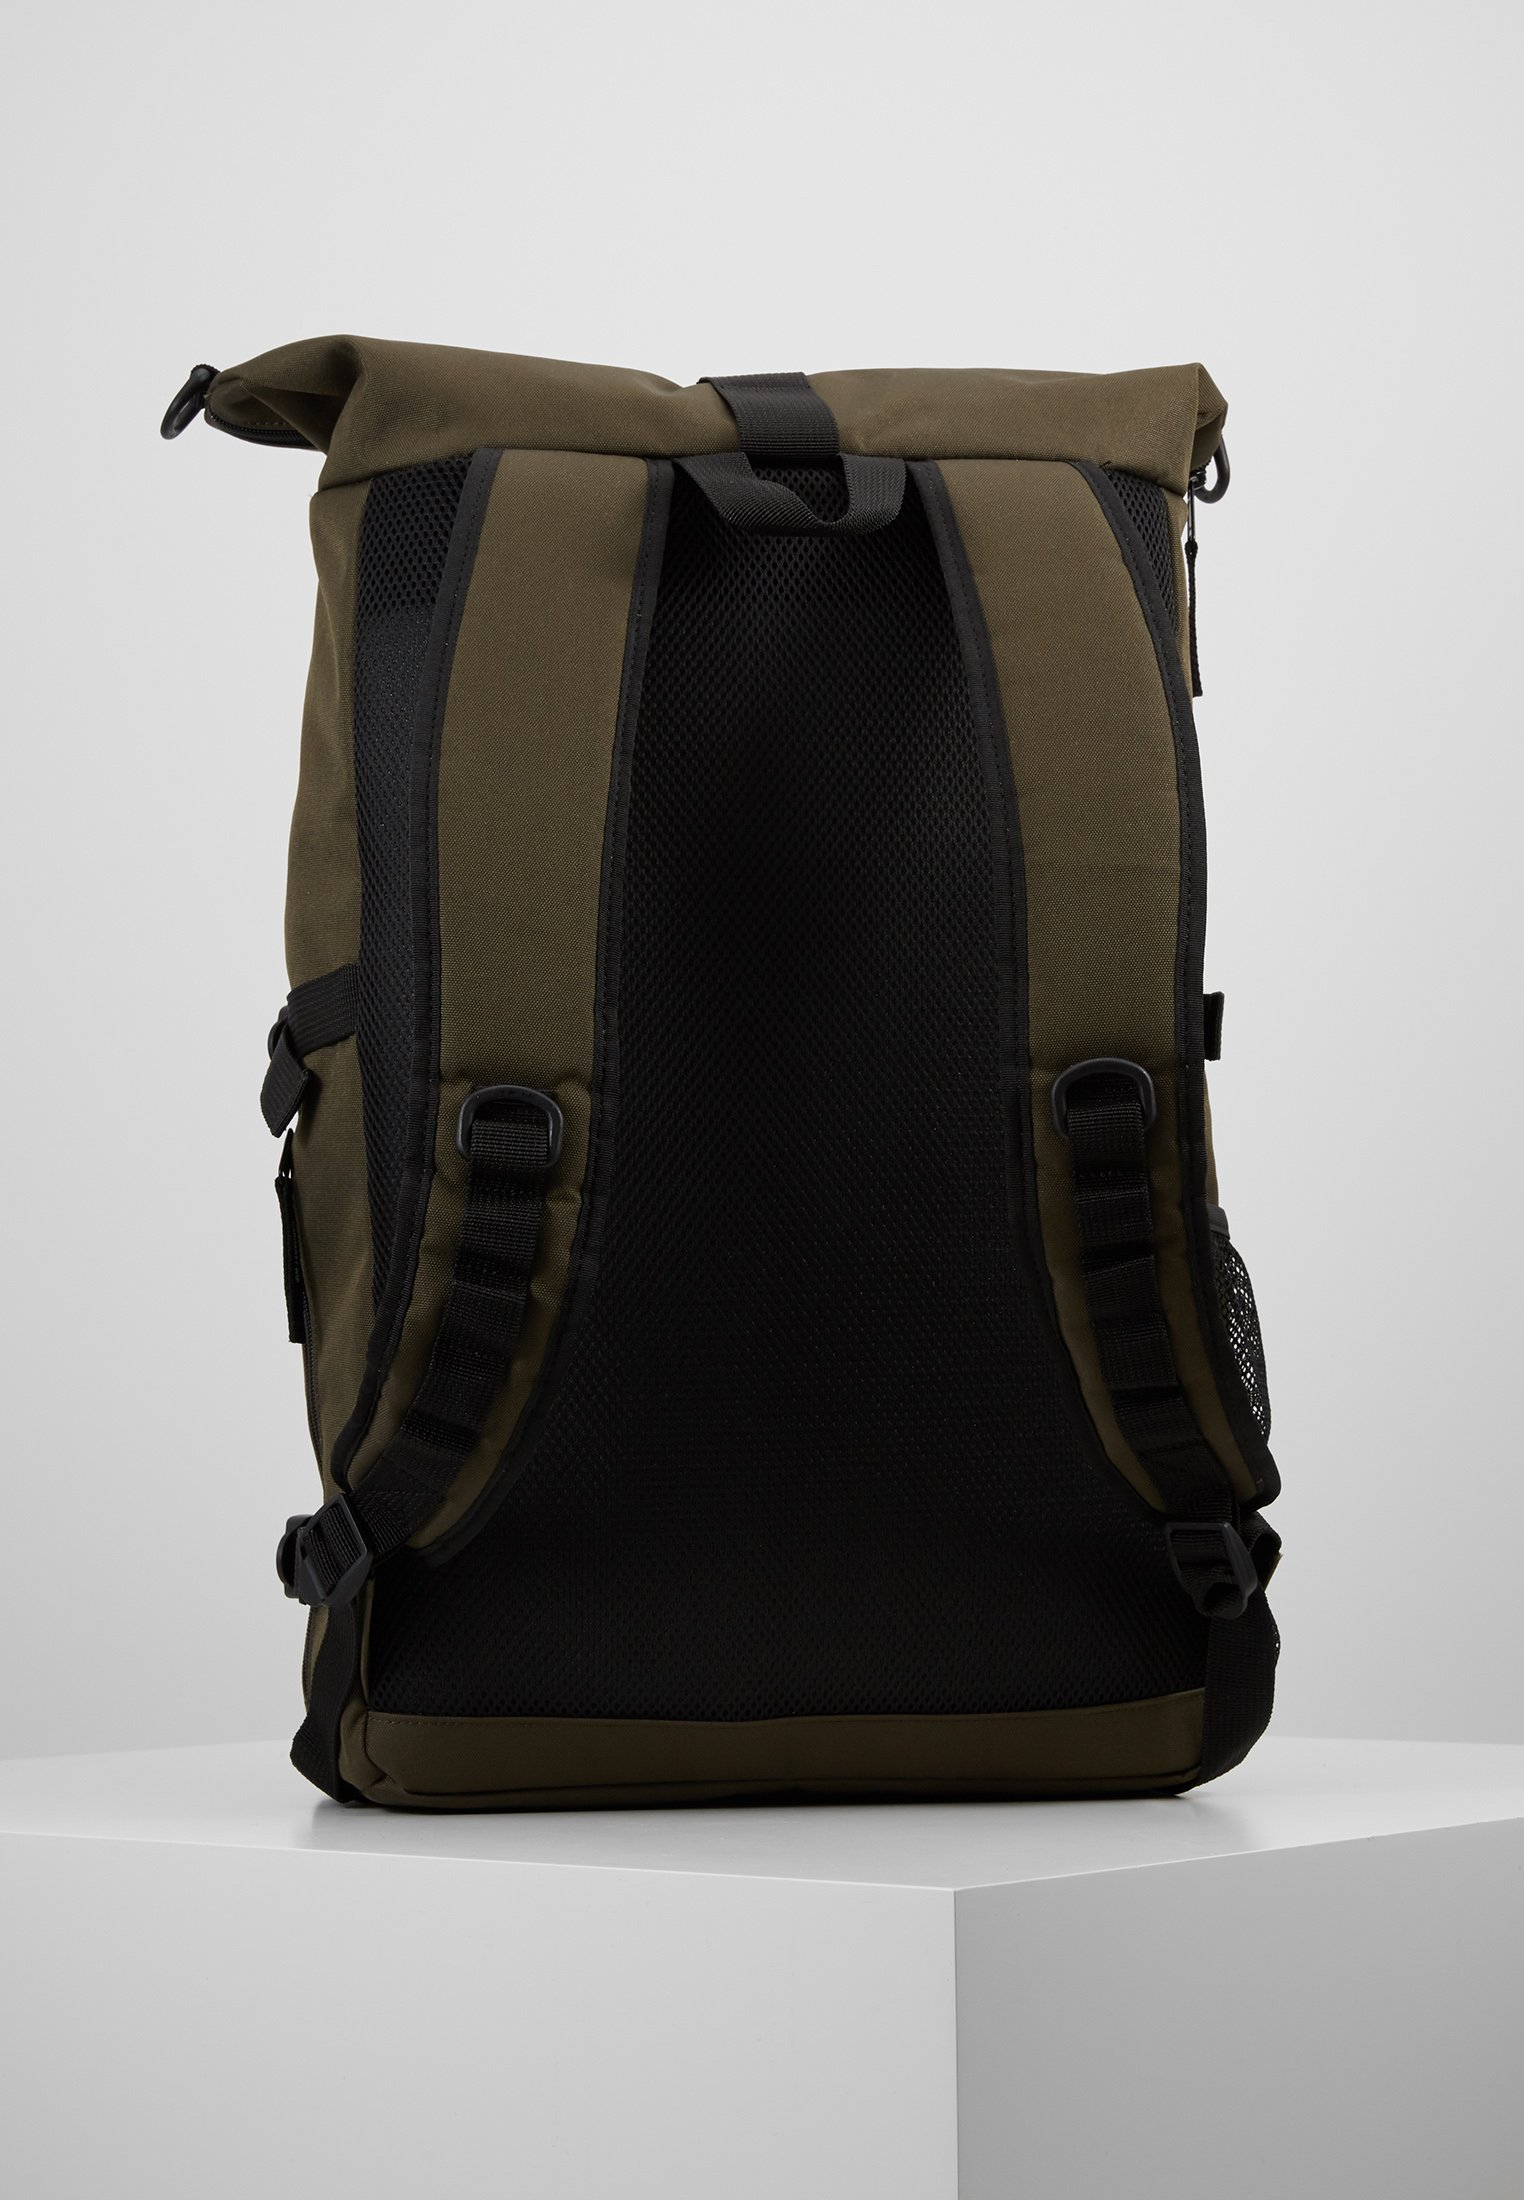 Carhartt WIP PHILIS BACKPACK - Tagesrucksack - cypress/khaki - Herrentaschen kpU7z